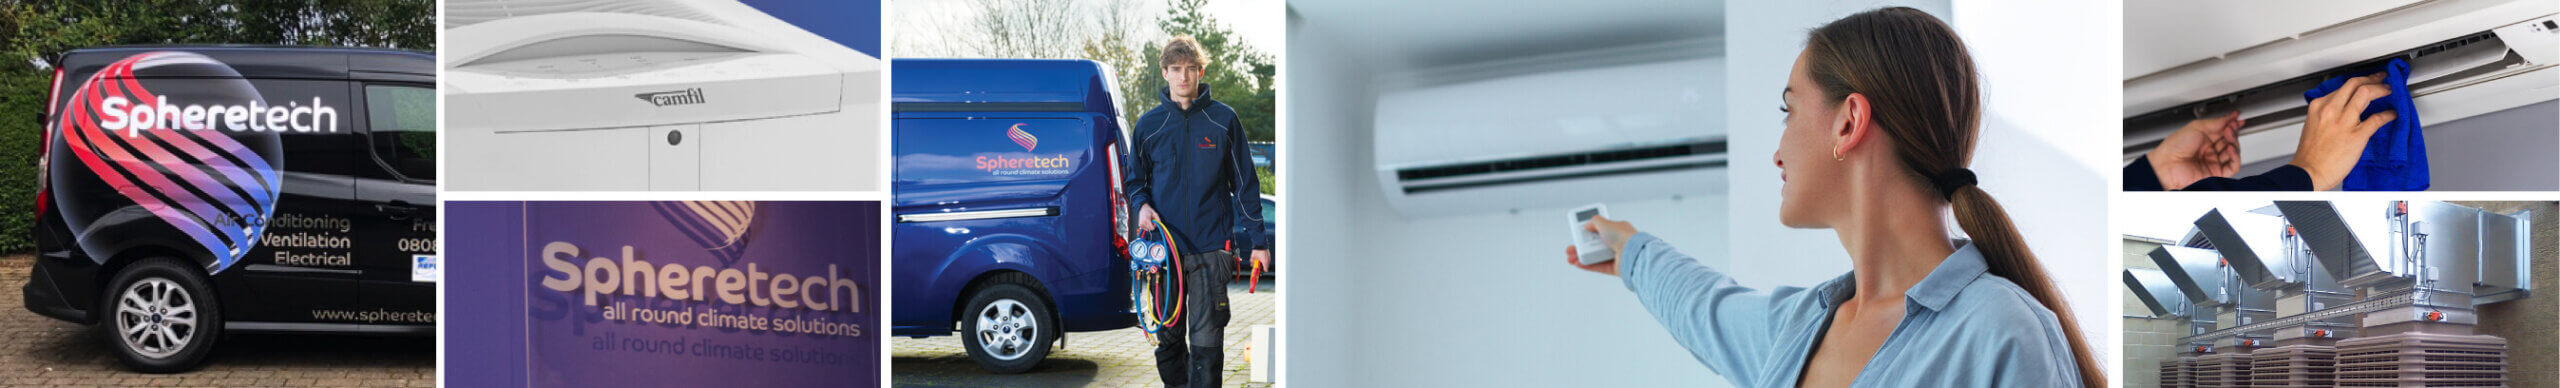 air ventilation spheretech